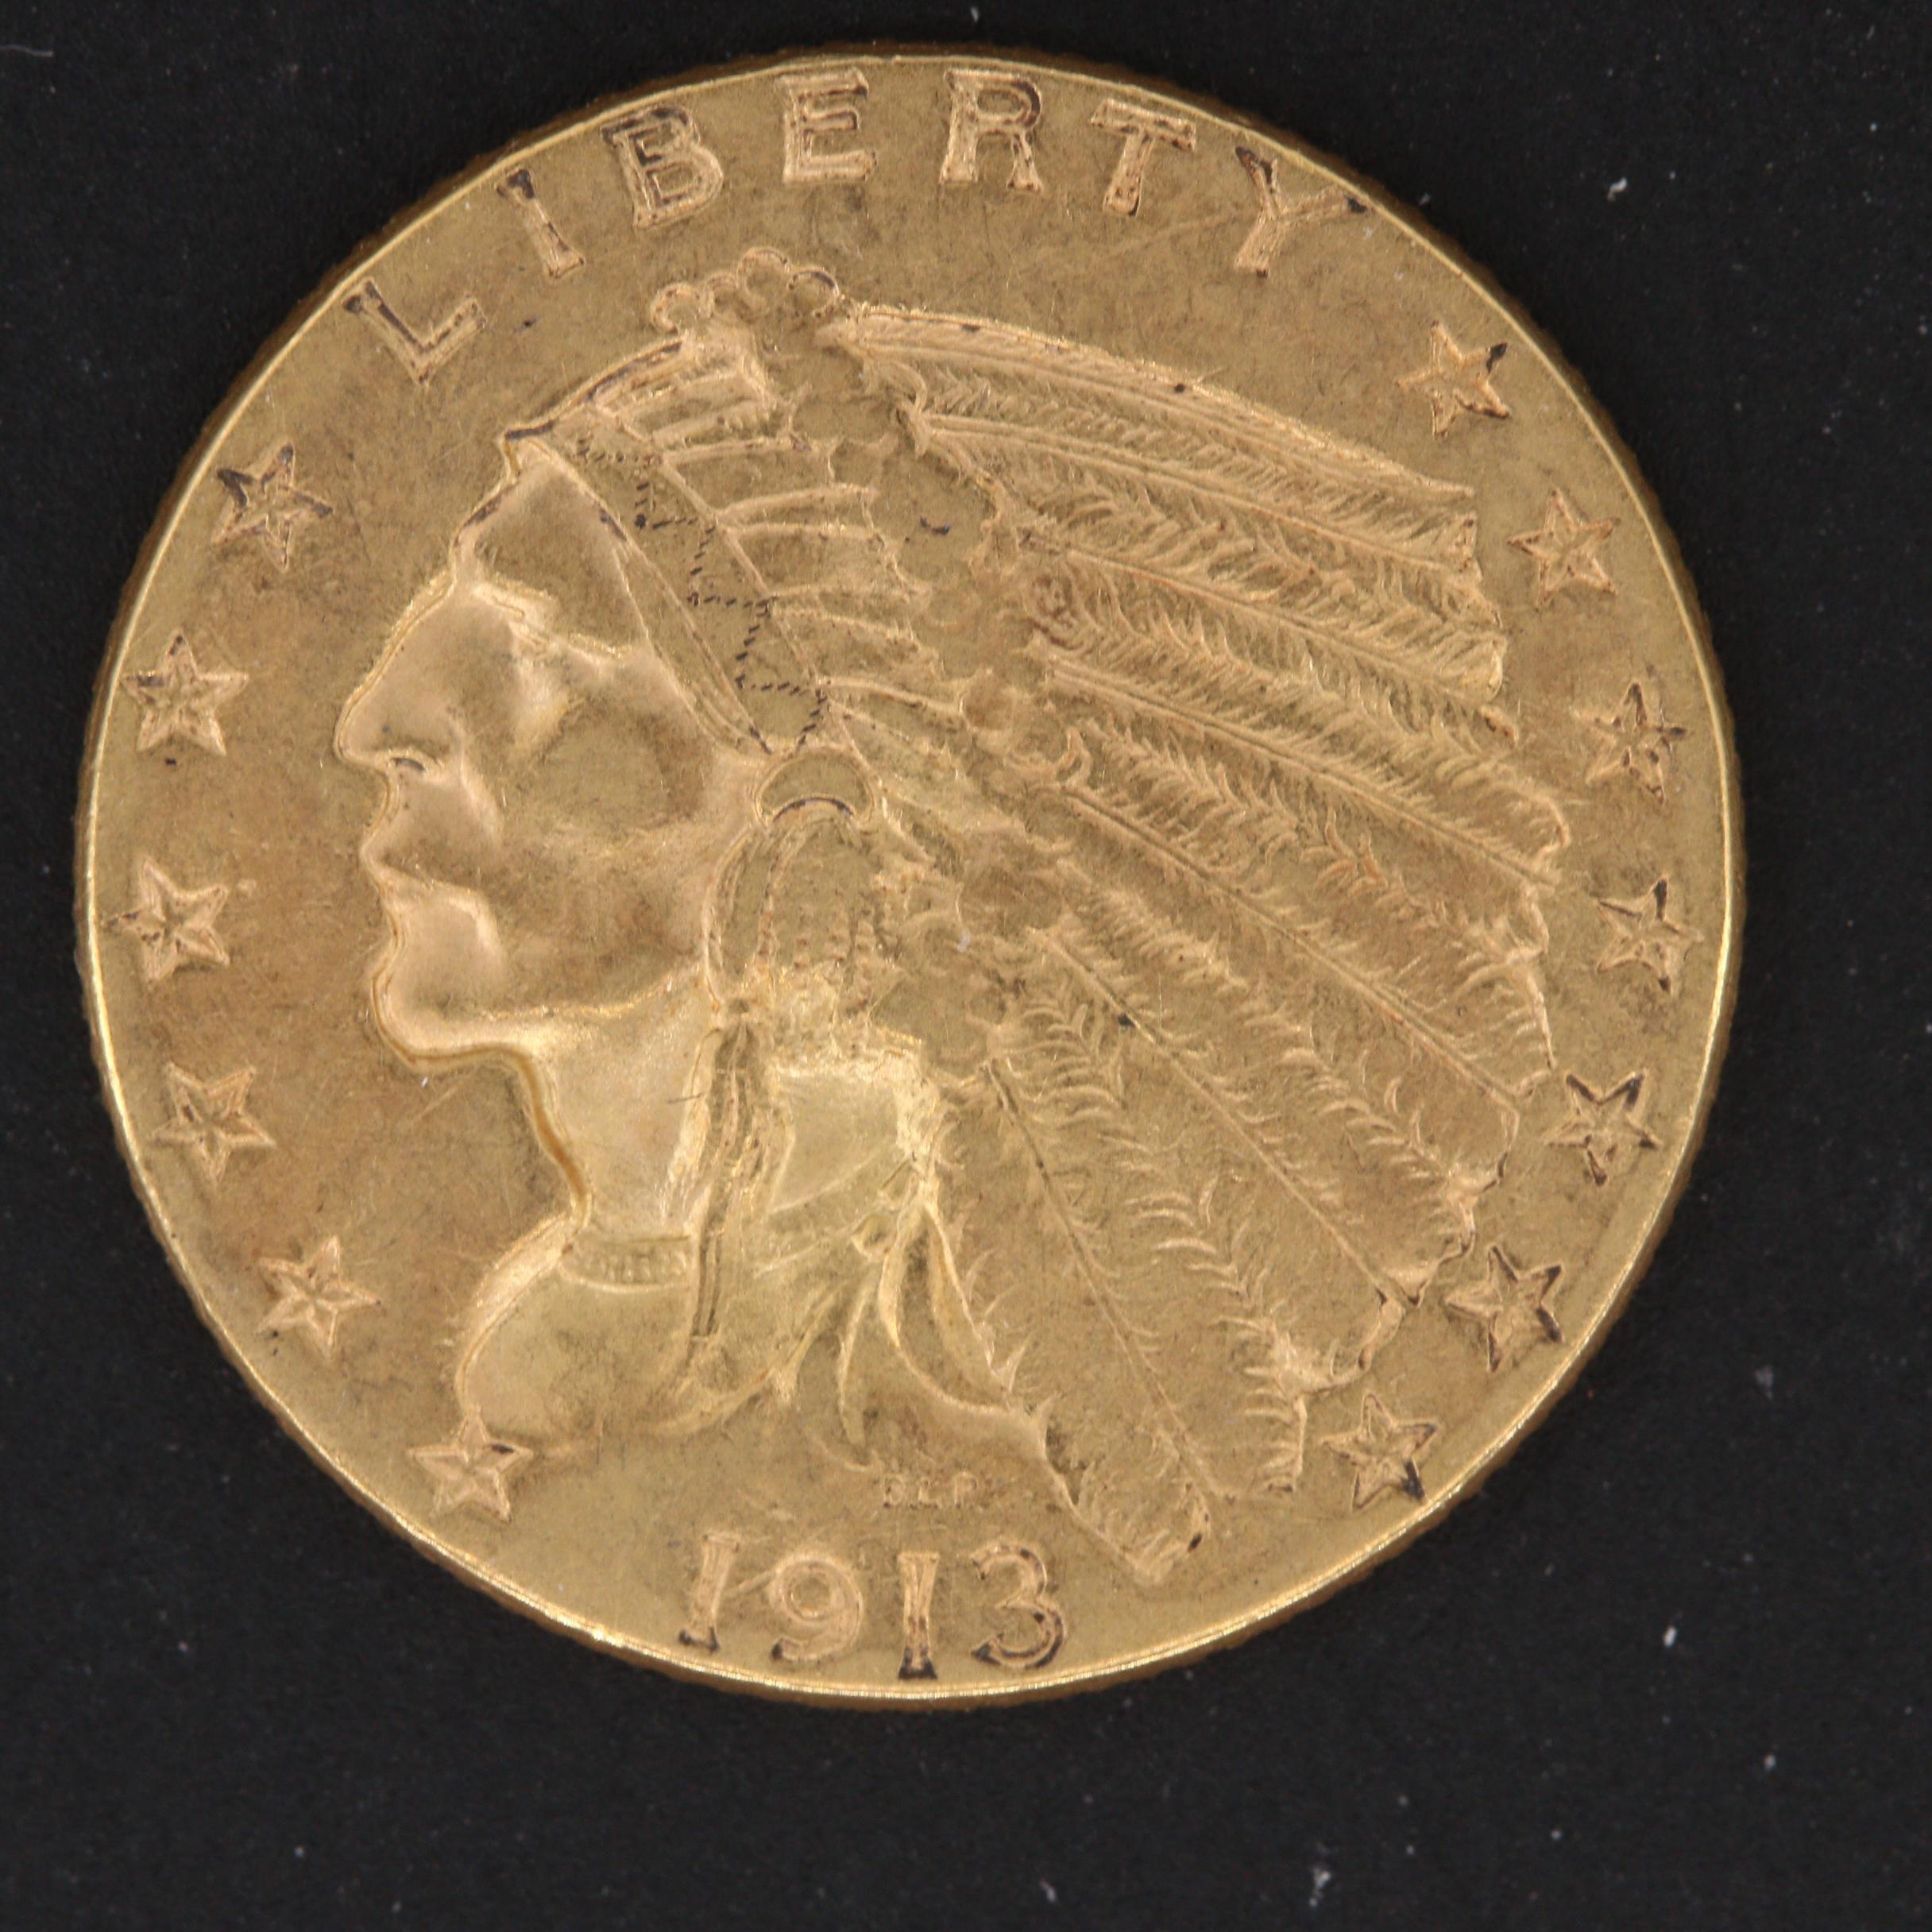 1913 Indian Head $2.50 Quarter Eagle Gold Coin